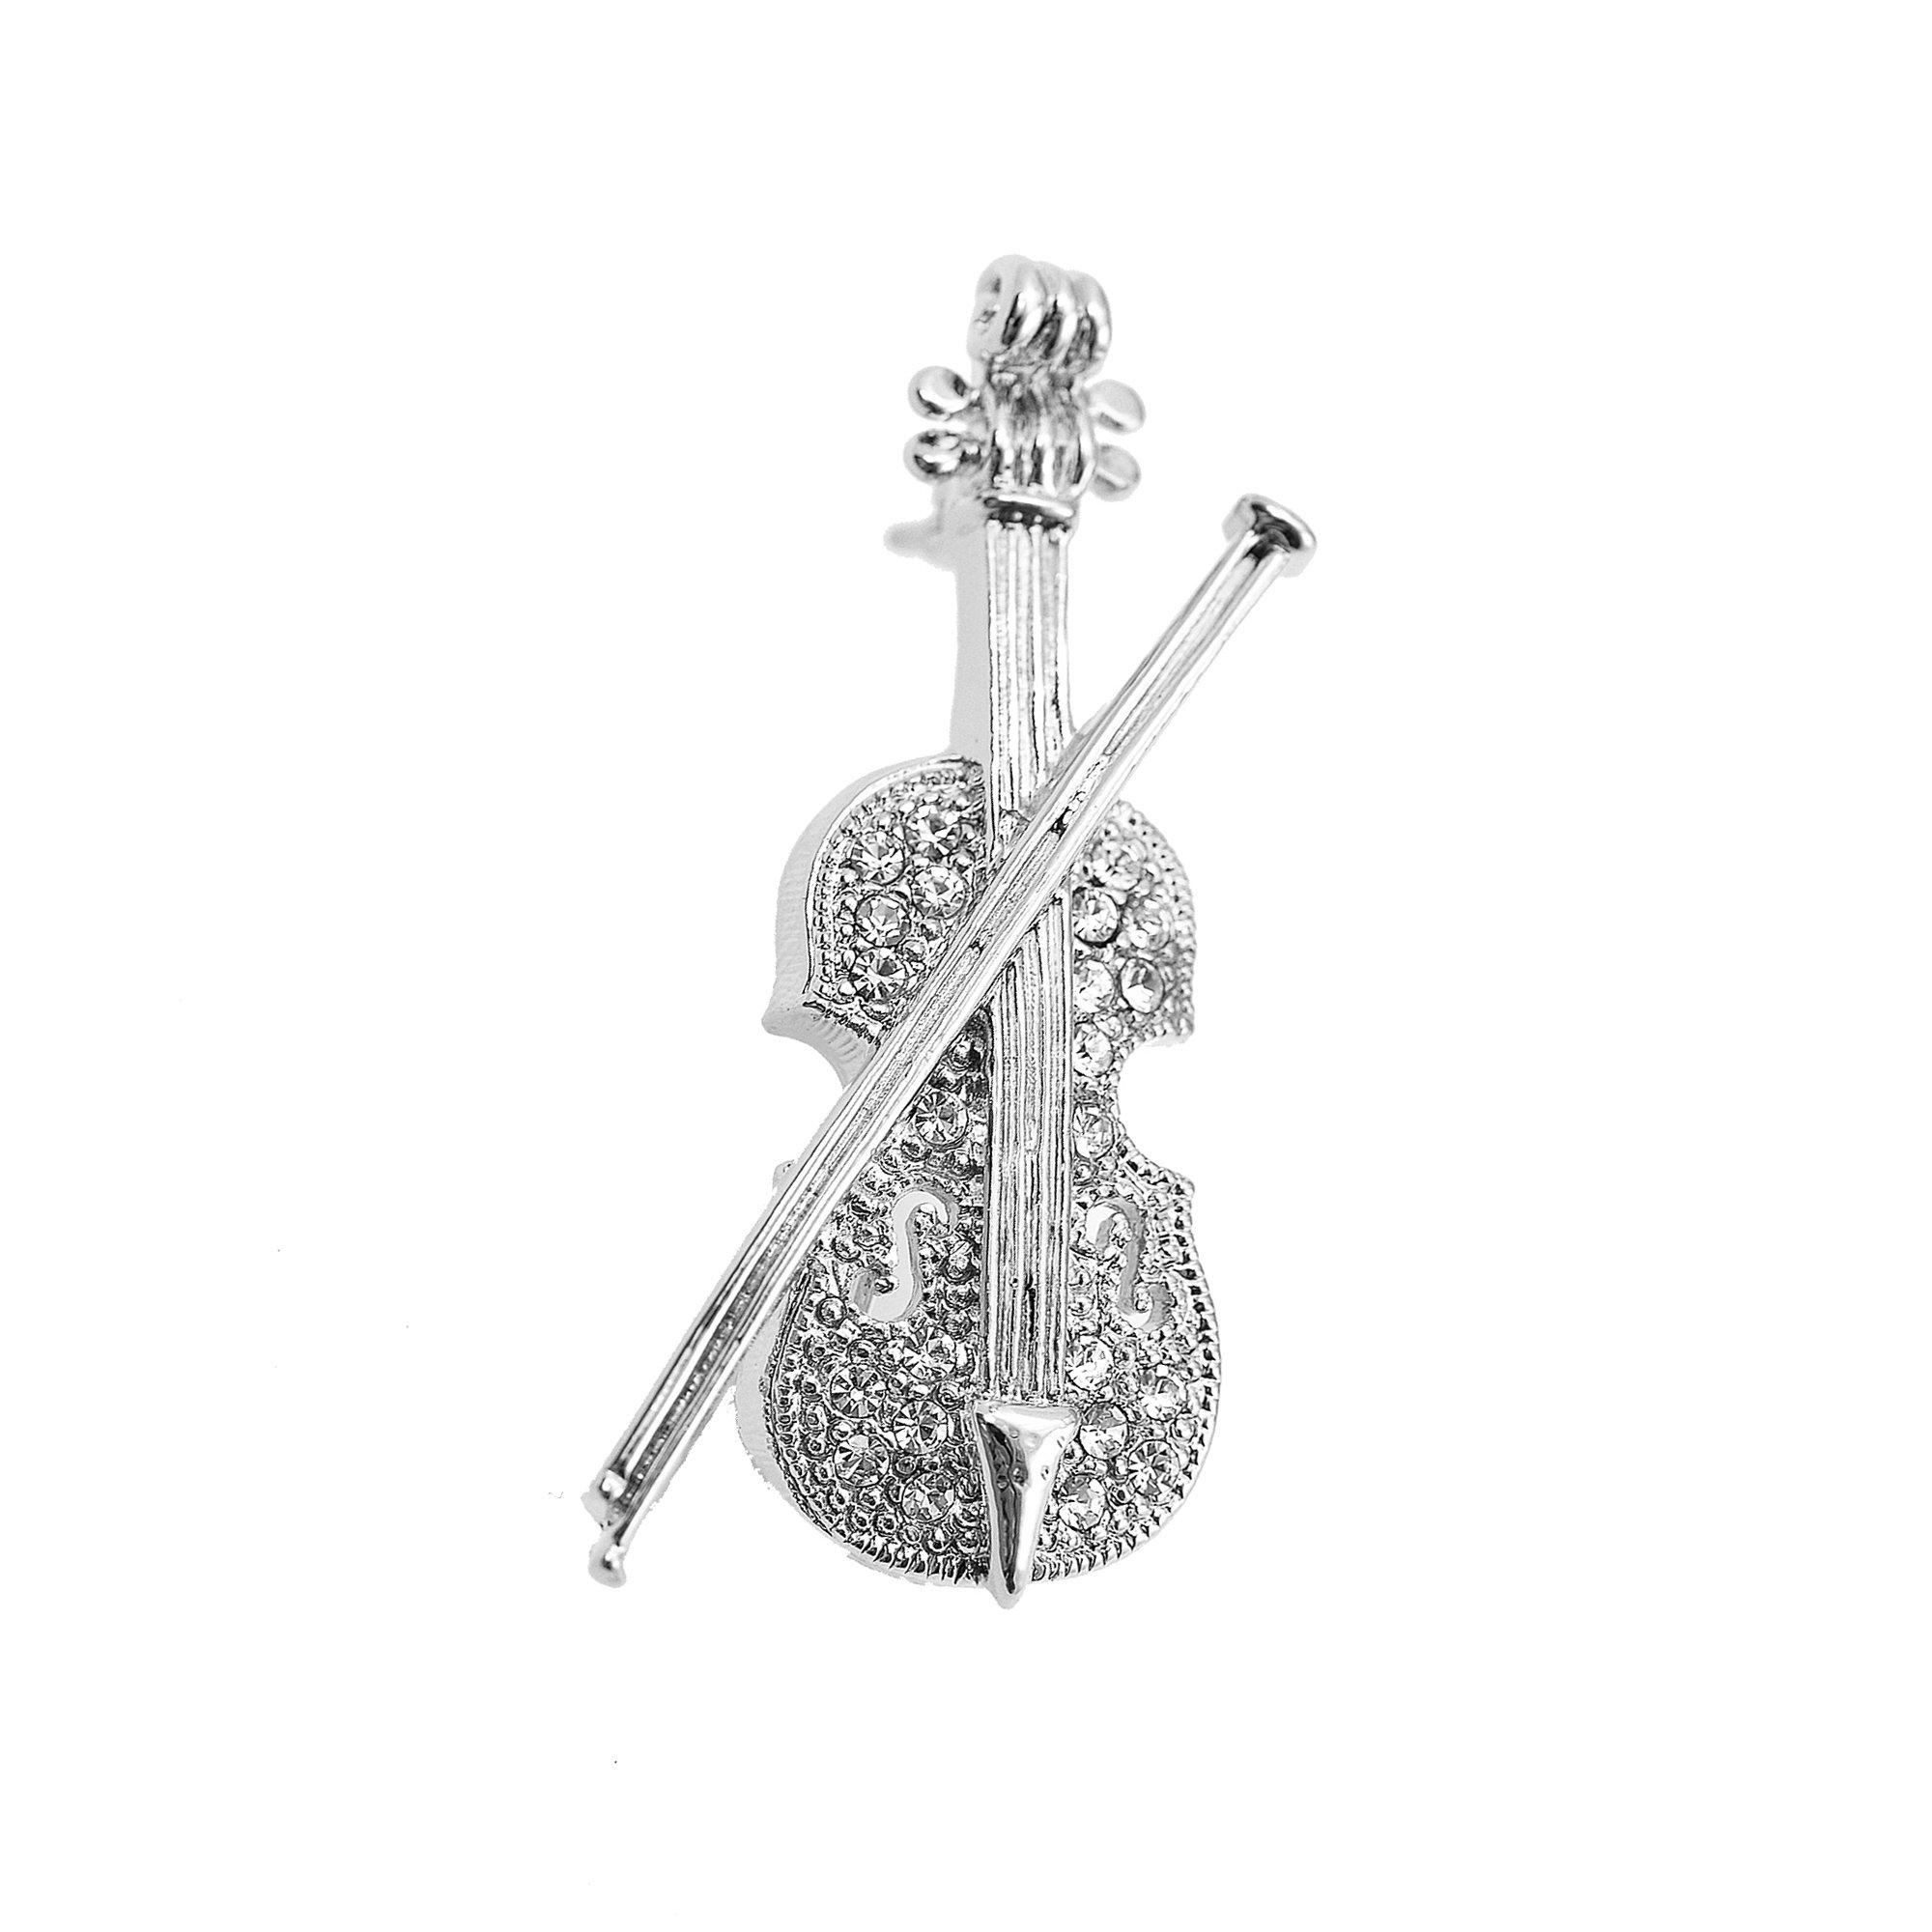 SpinningDaisy Tiny Jewel Crystal Cello with Bow Brooch Pin (Silver)